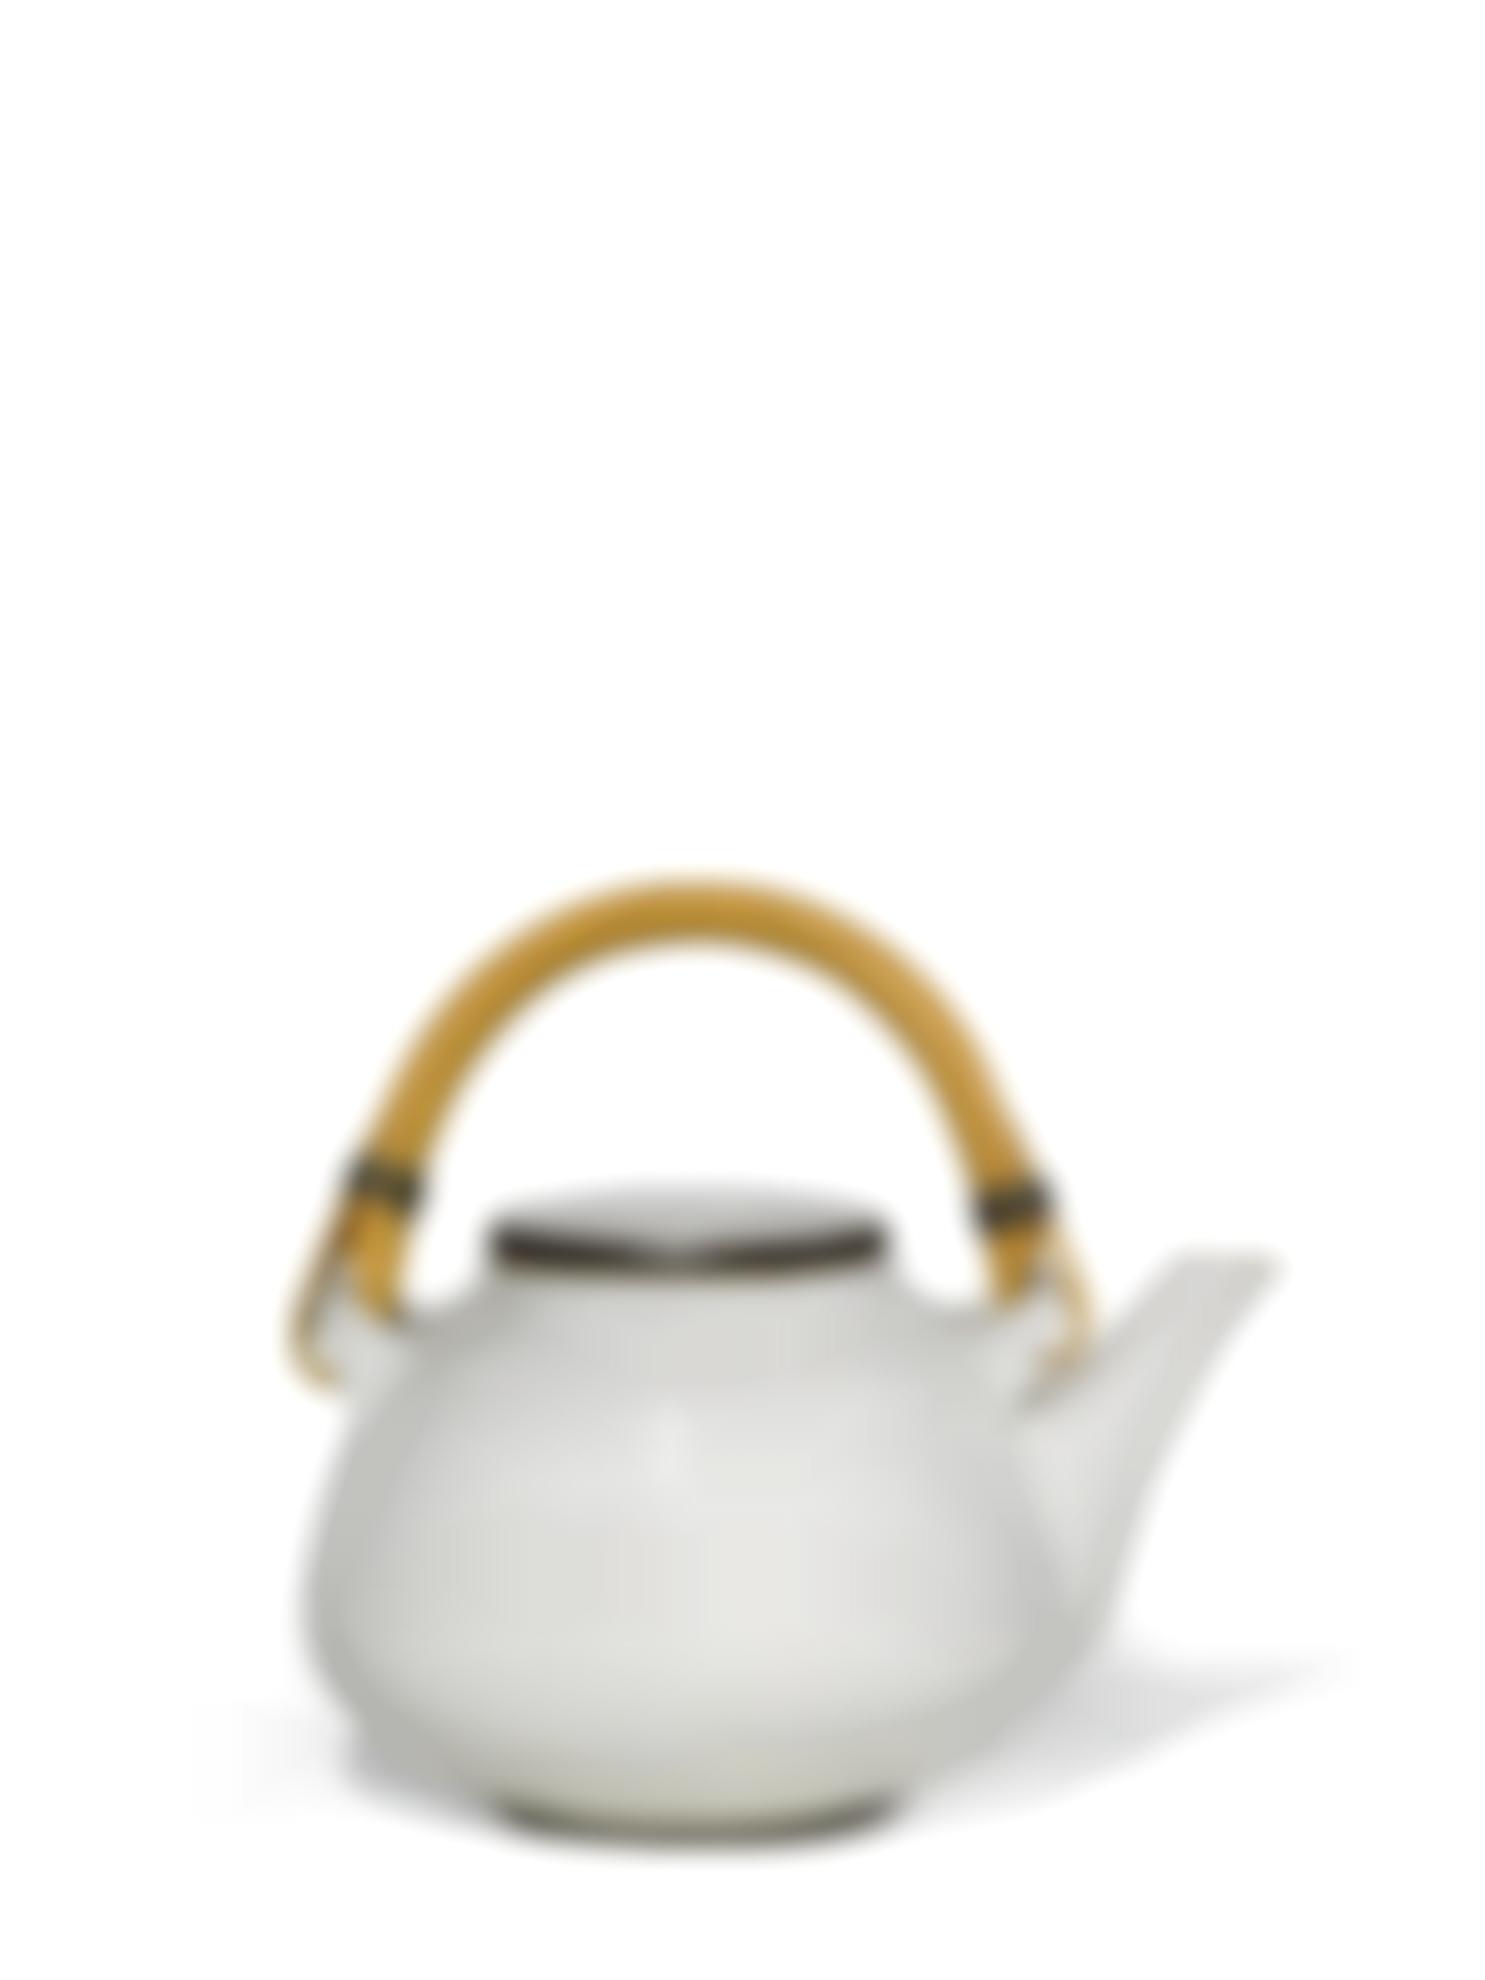 Dame Lucie Rie - Teapot-1950